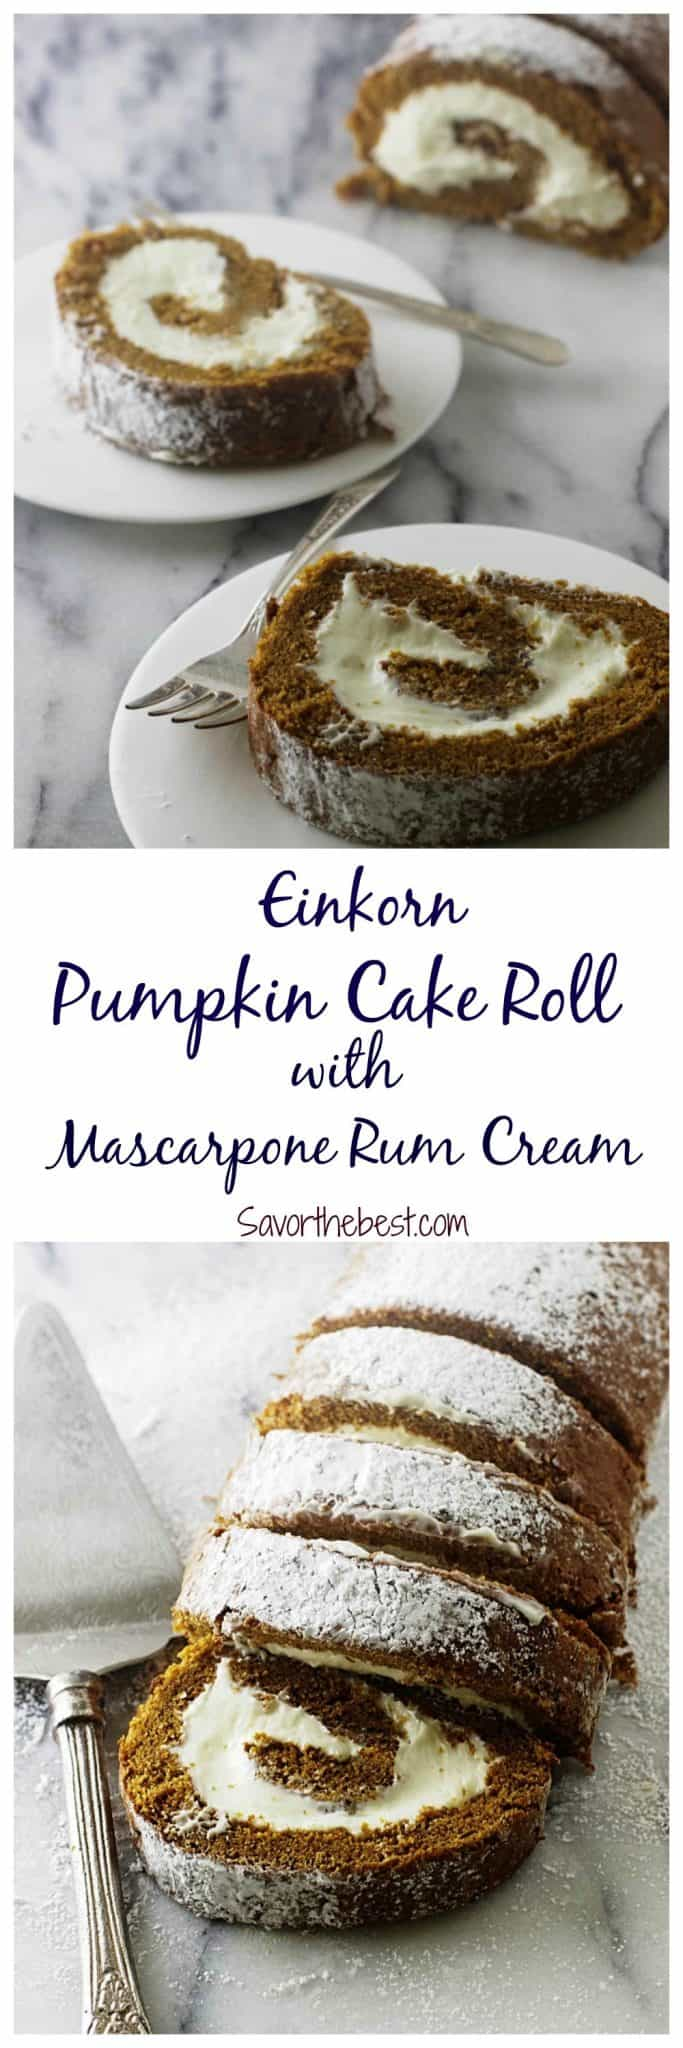 pumpkin cake roll with mascarpone rum cream